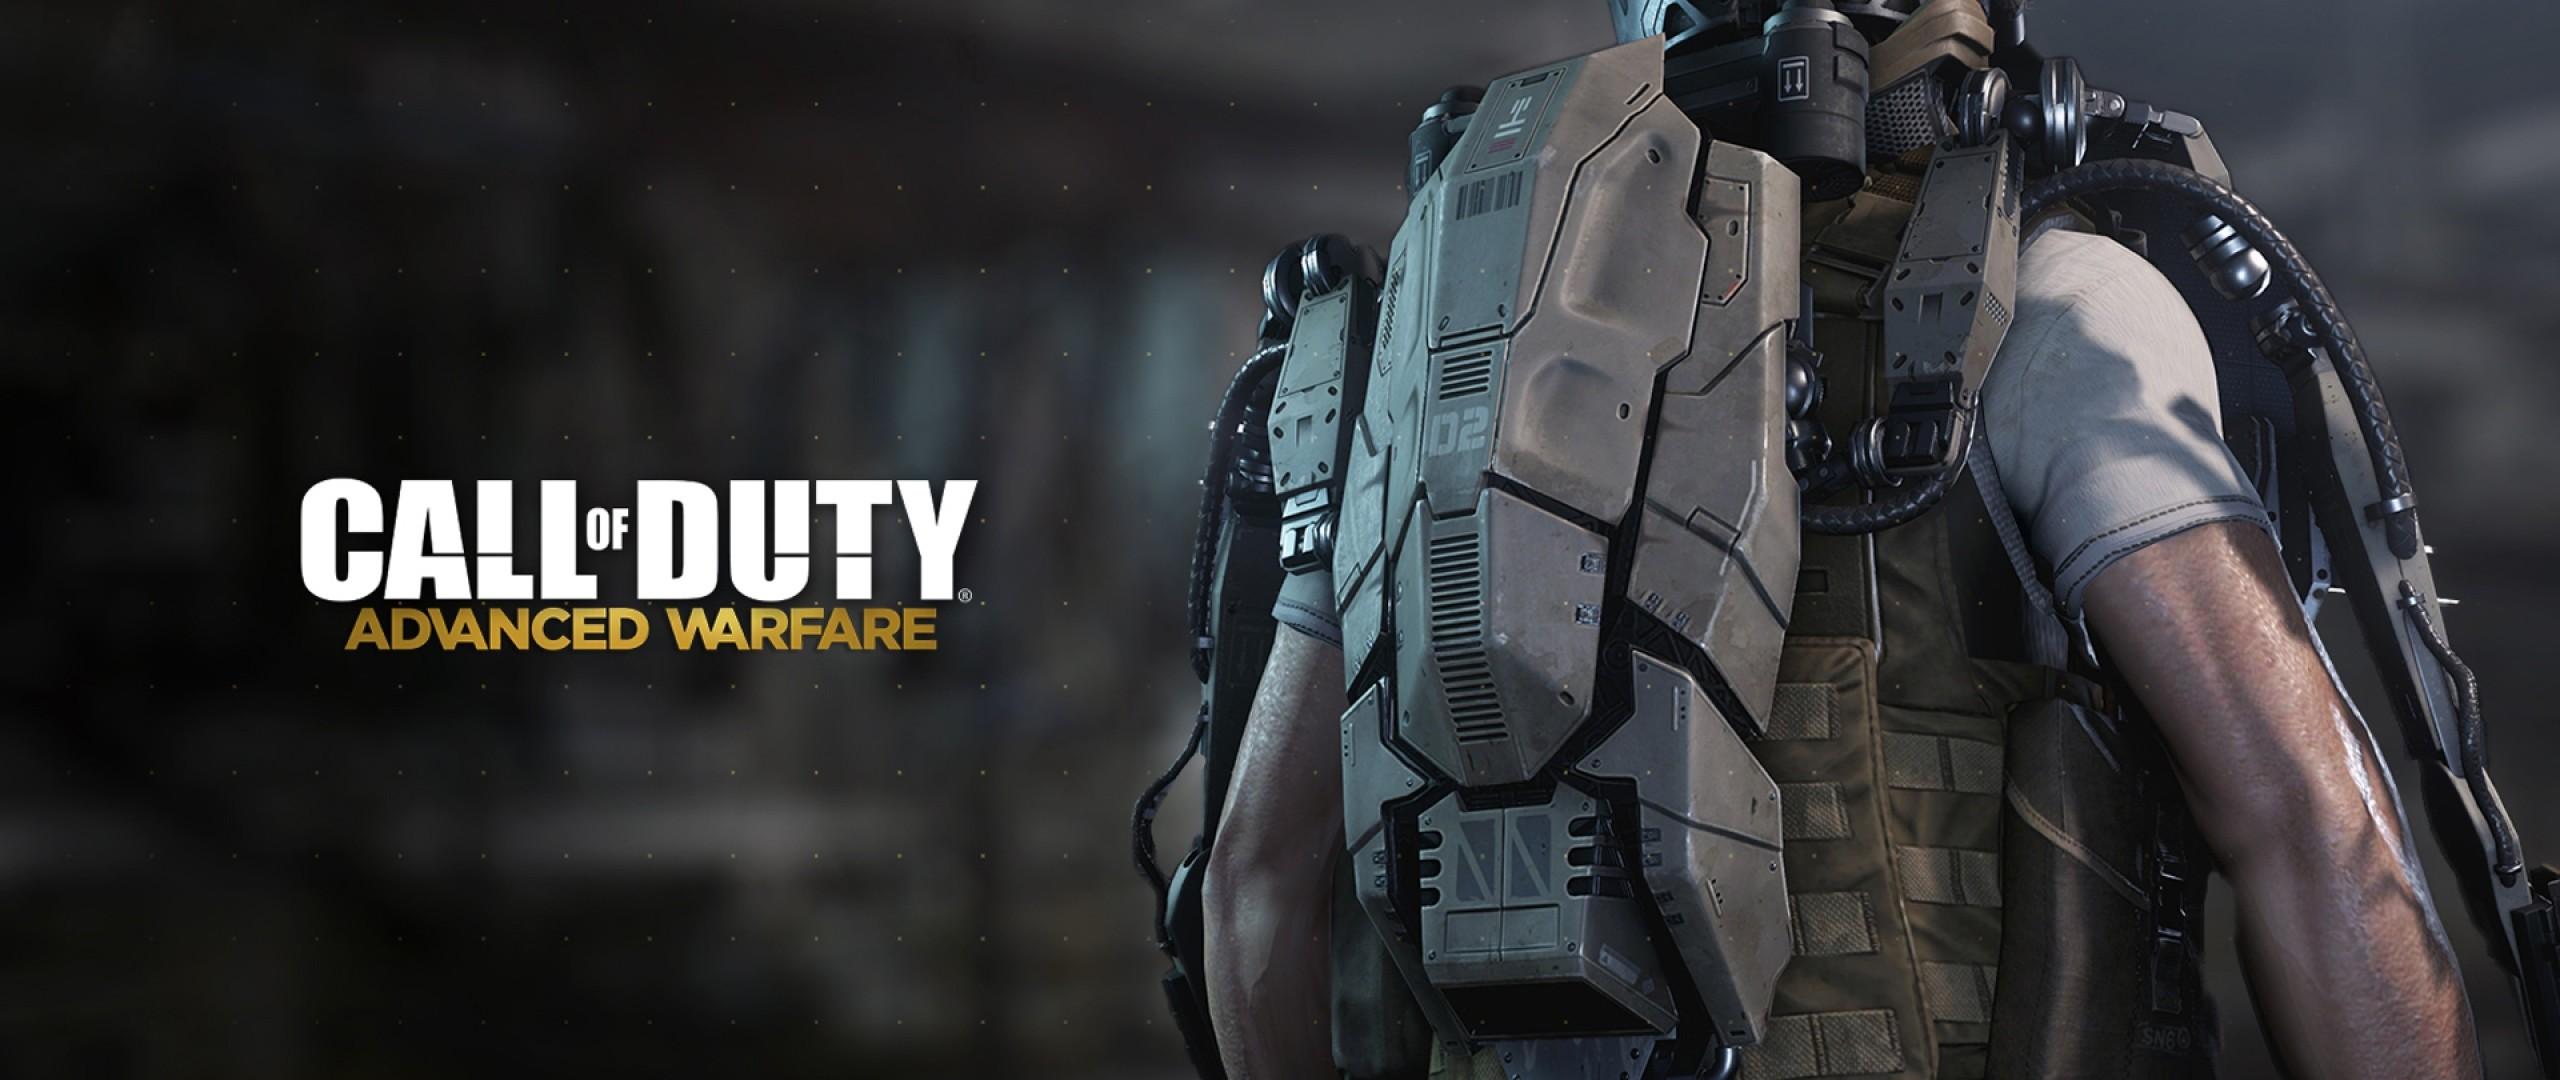 Preview wallpaper call of duty, call of duty advanced warfare, art 2560×1080